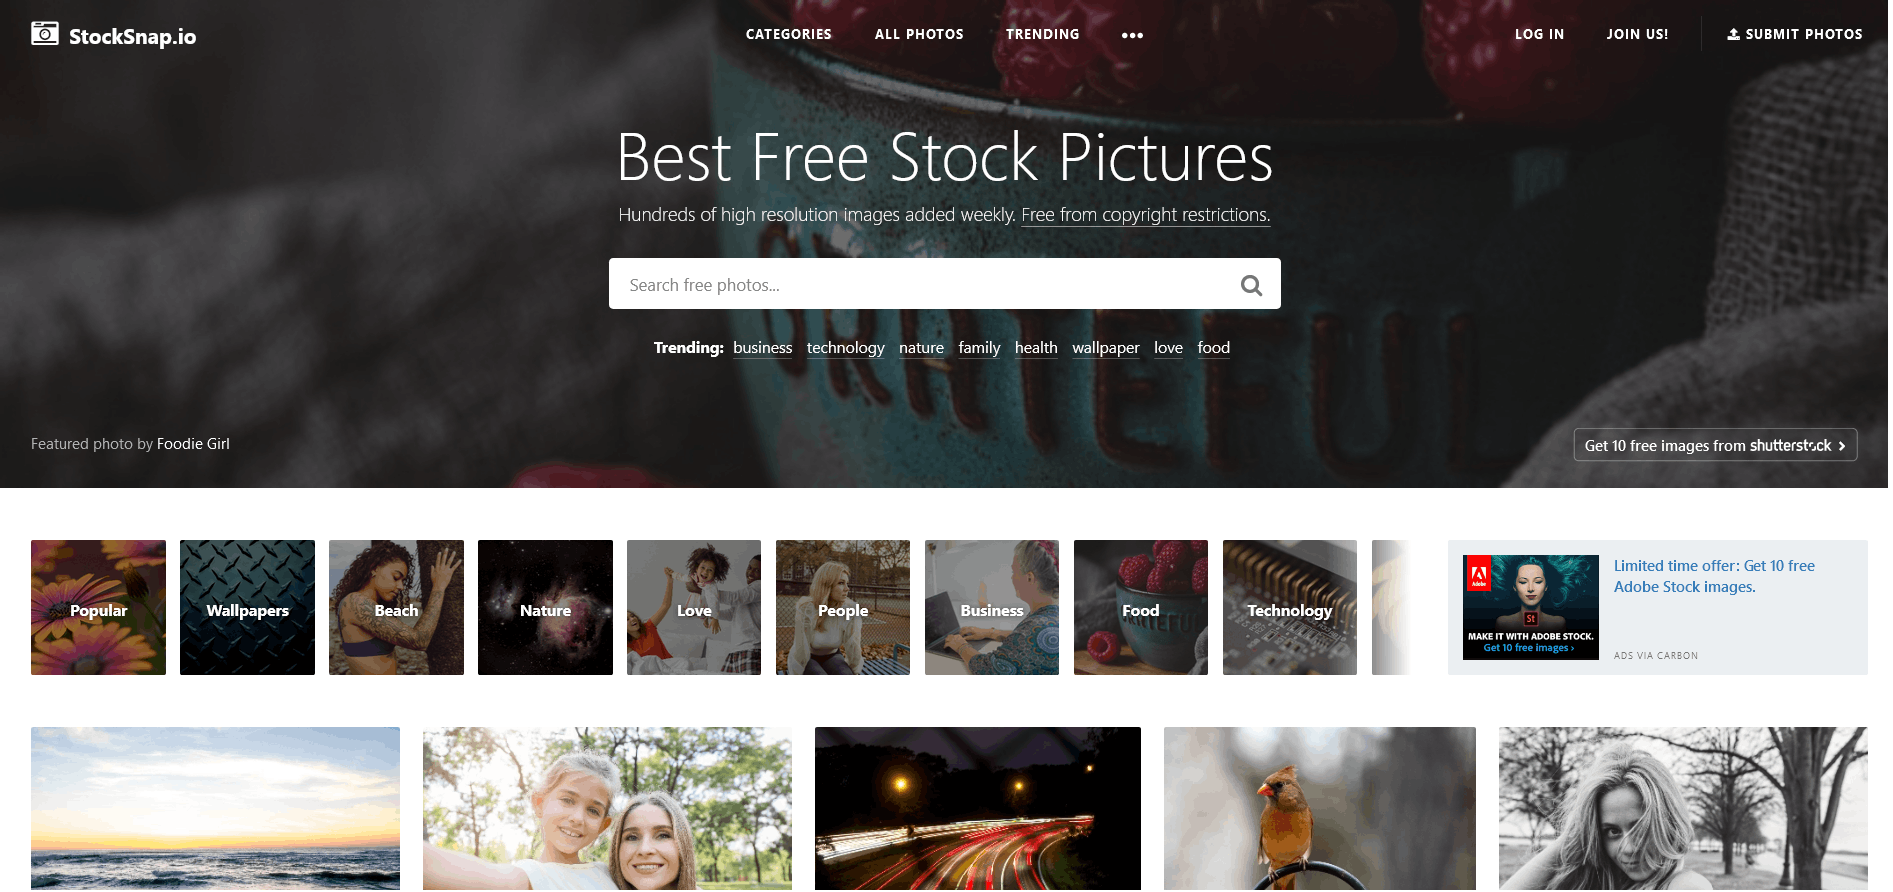 Screenshot 2021-04-30 at 08-26-48 Free Stock Photos and Images.png